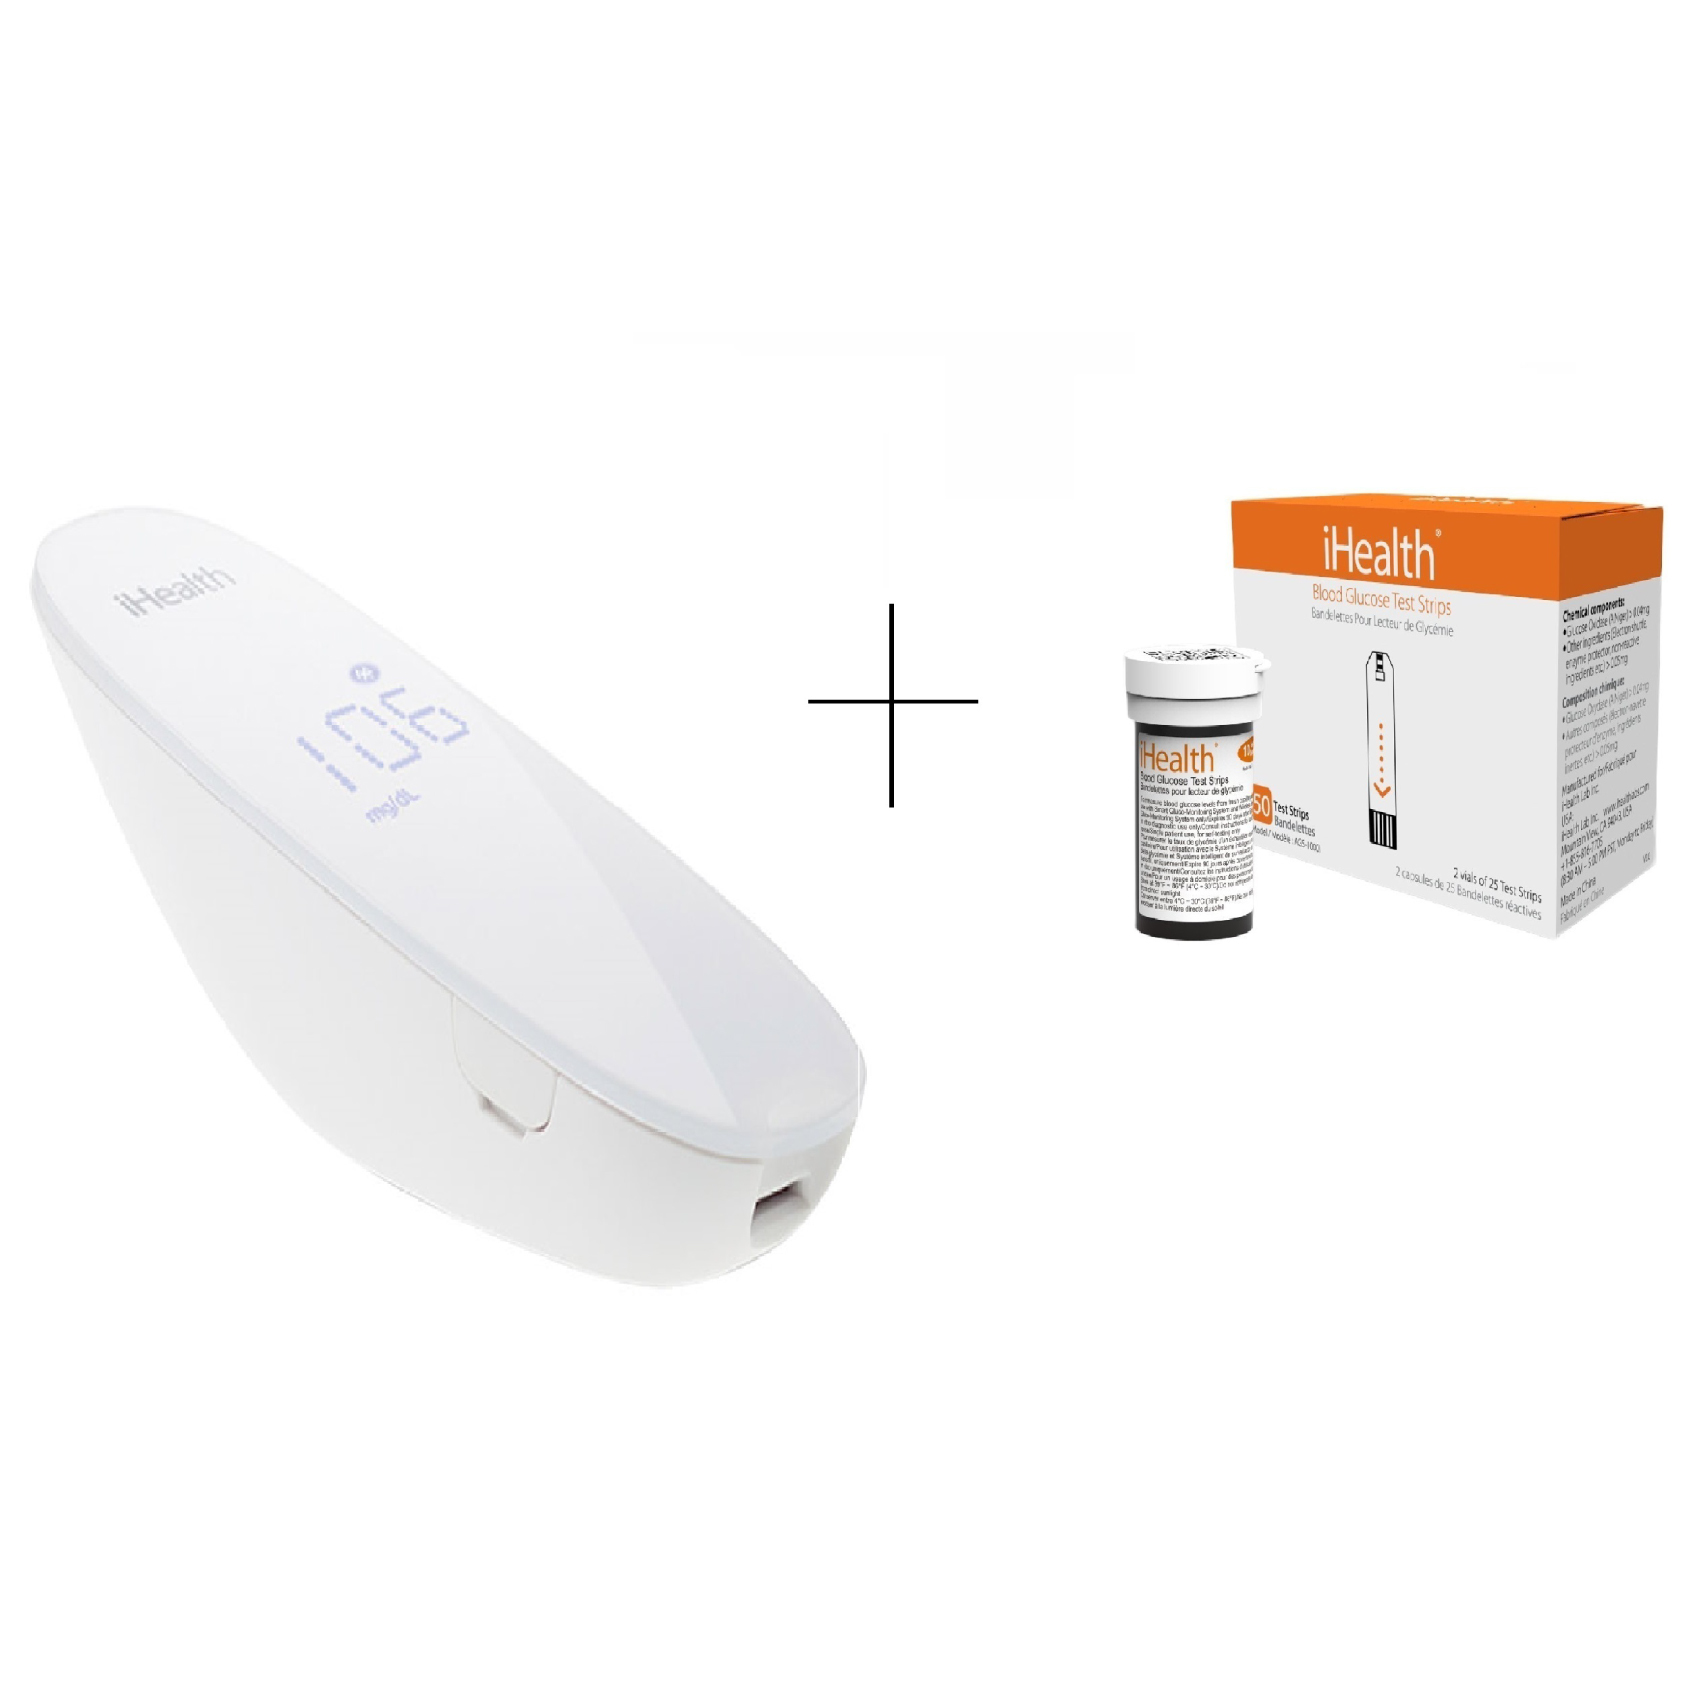 IHEALTH BG5 GLUCO MONITOR+STRIP